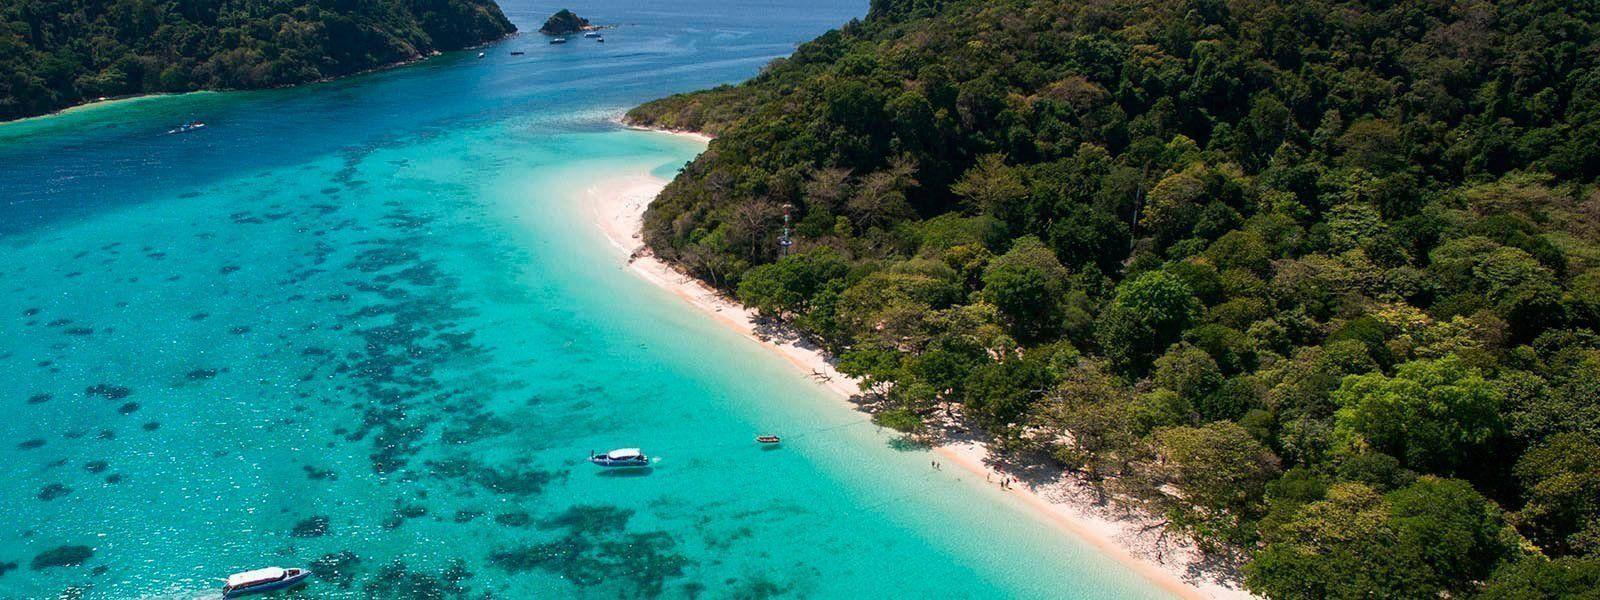 viaje-tailandia-barco-koh-rok-island